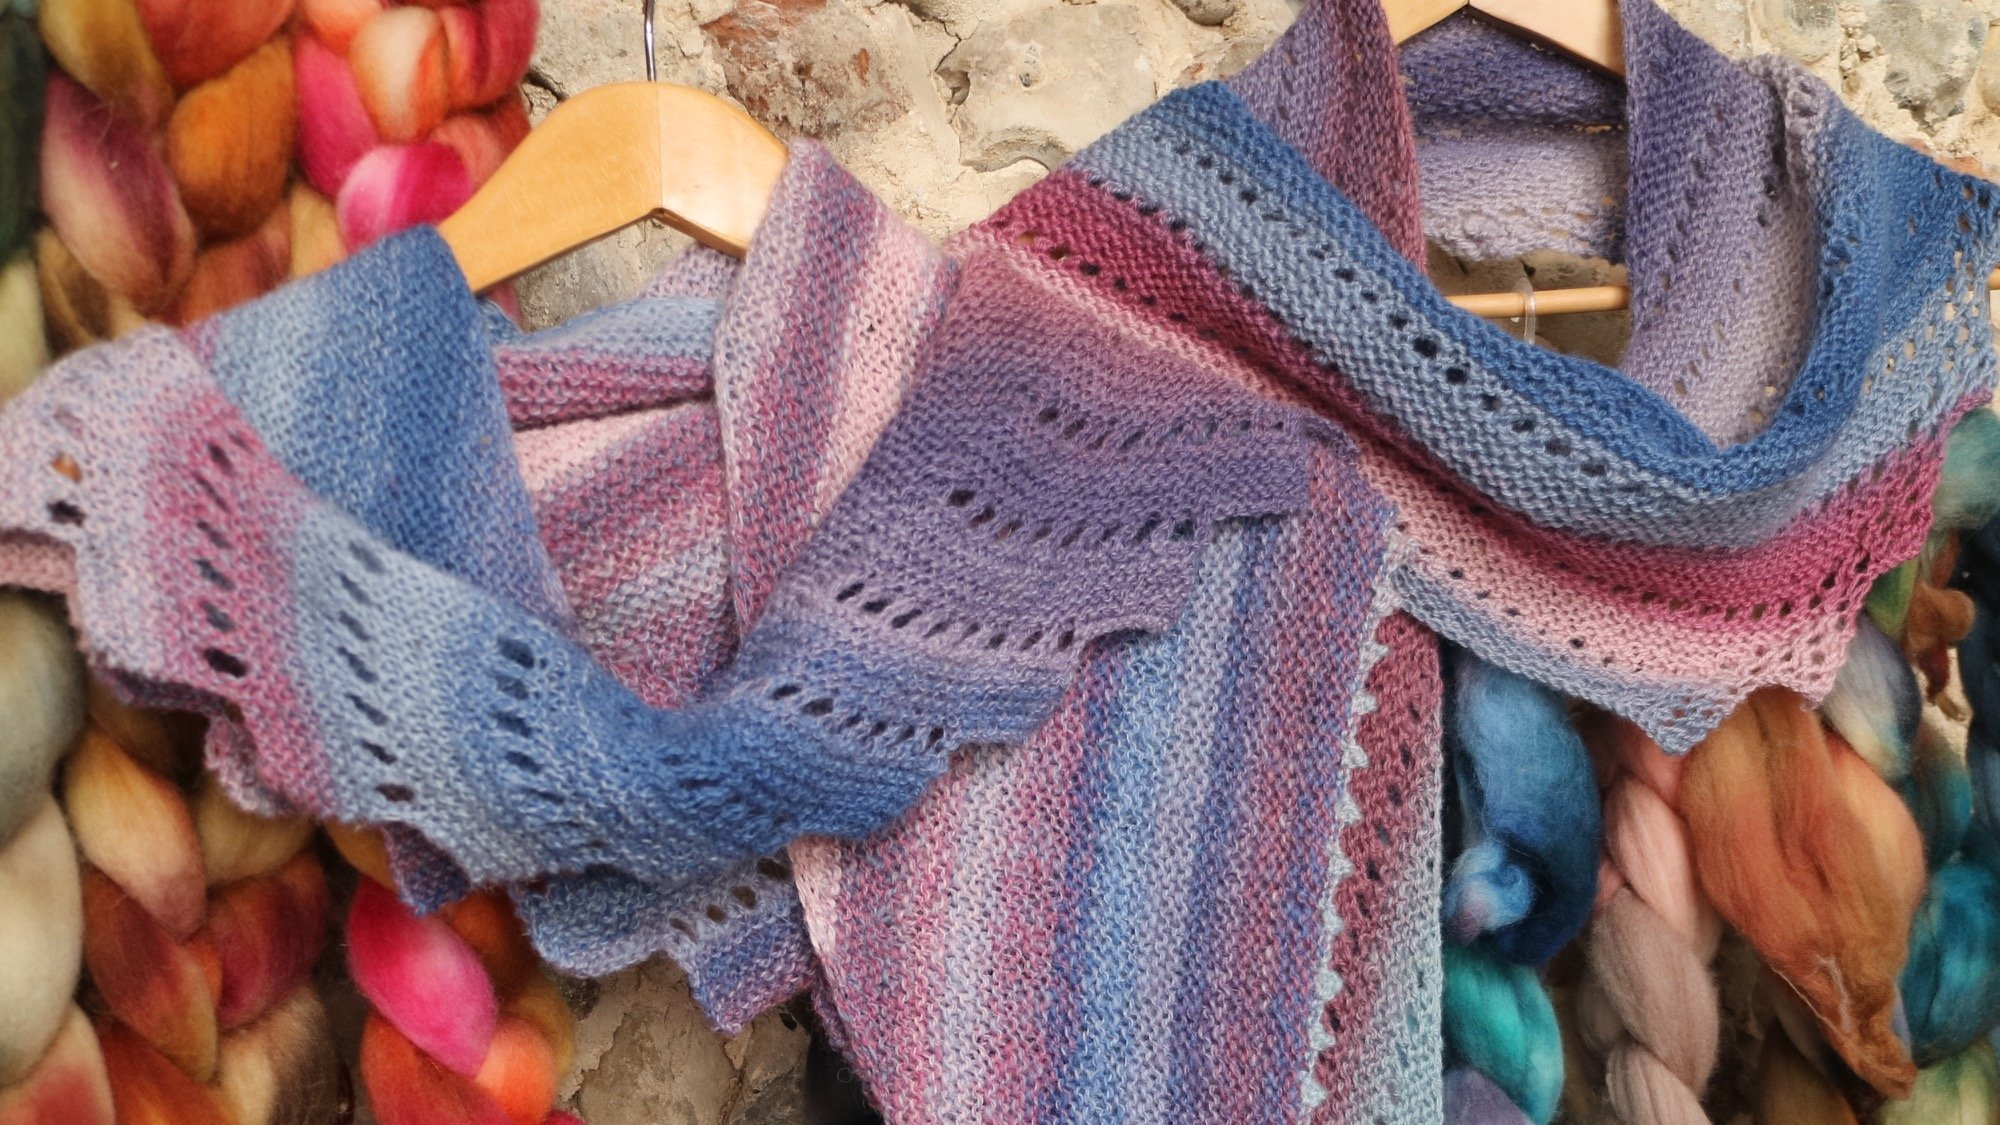 Hand Knitting Yarn Design : Hand spun yarn knitting patterns free lace shawls